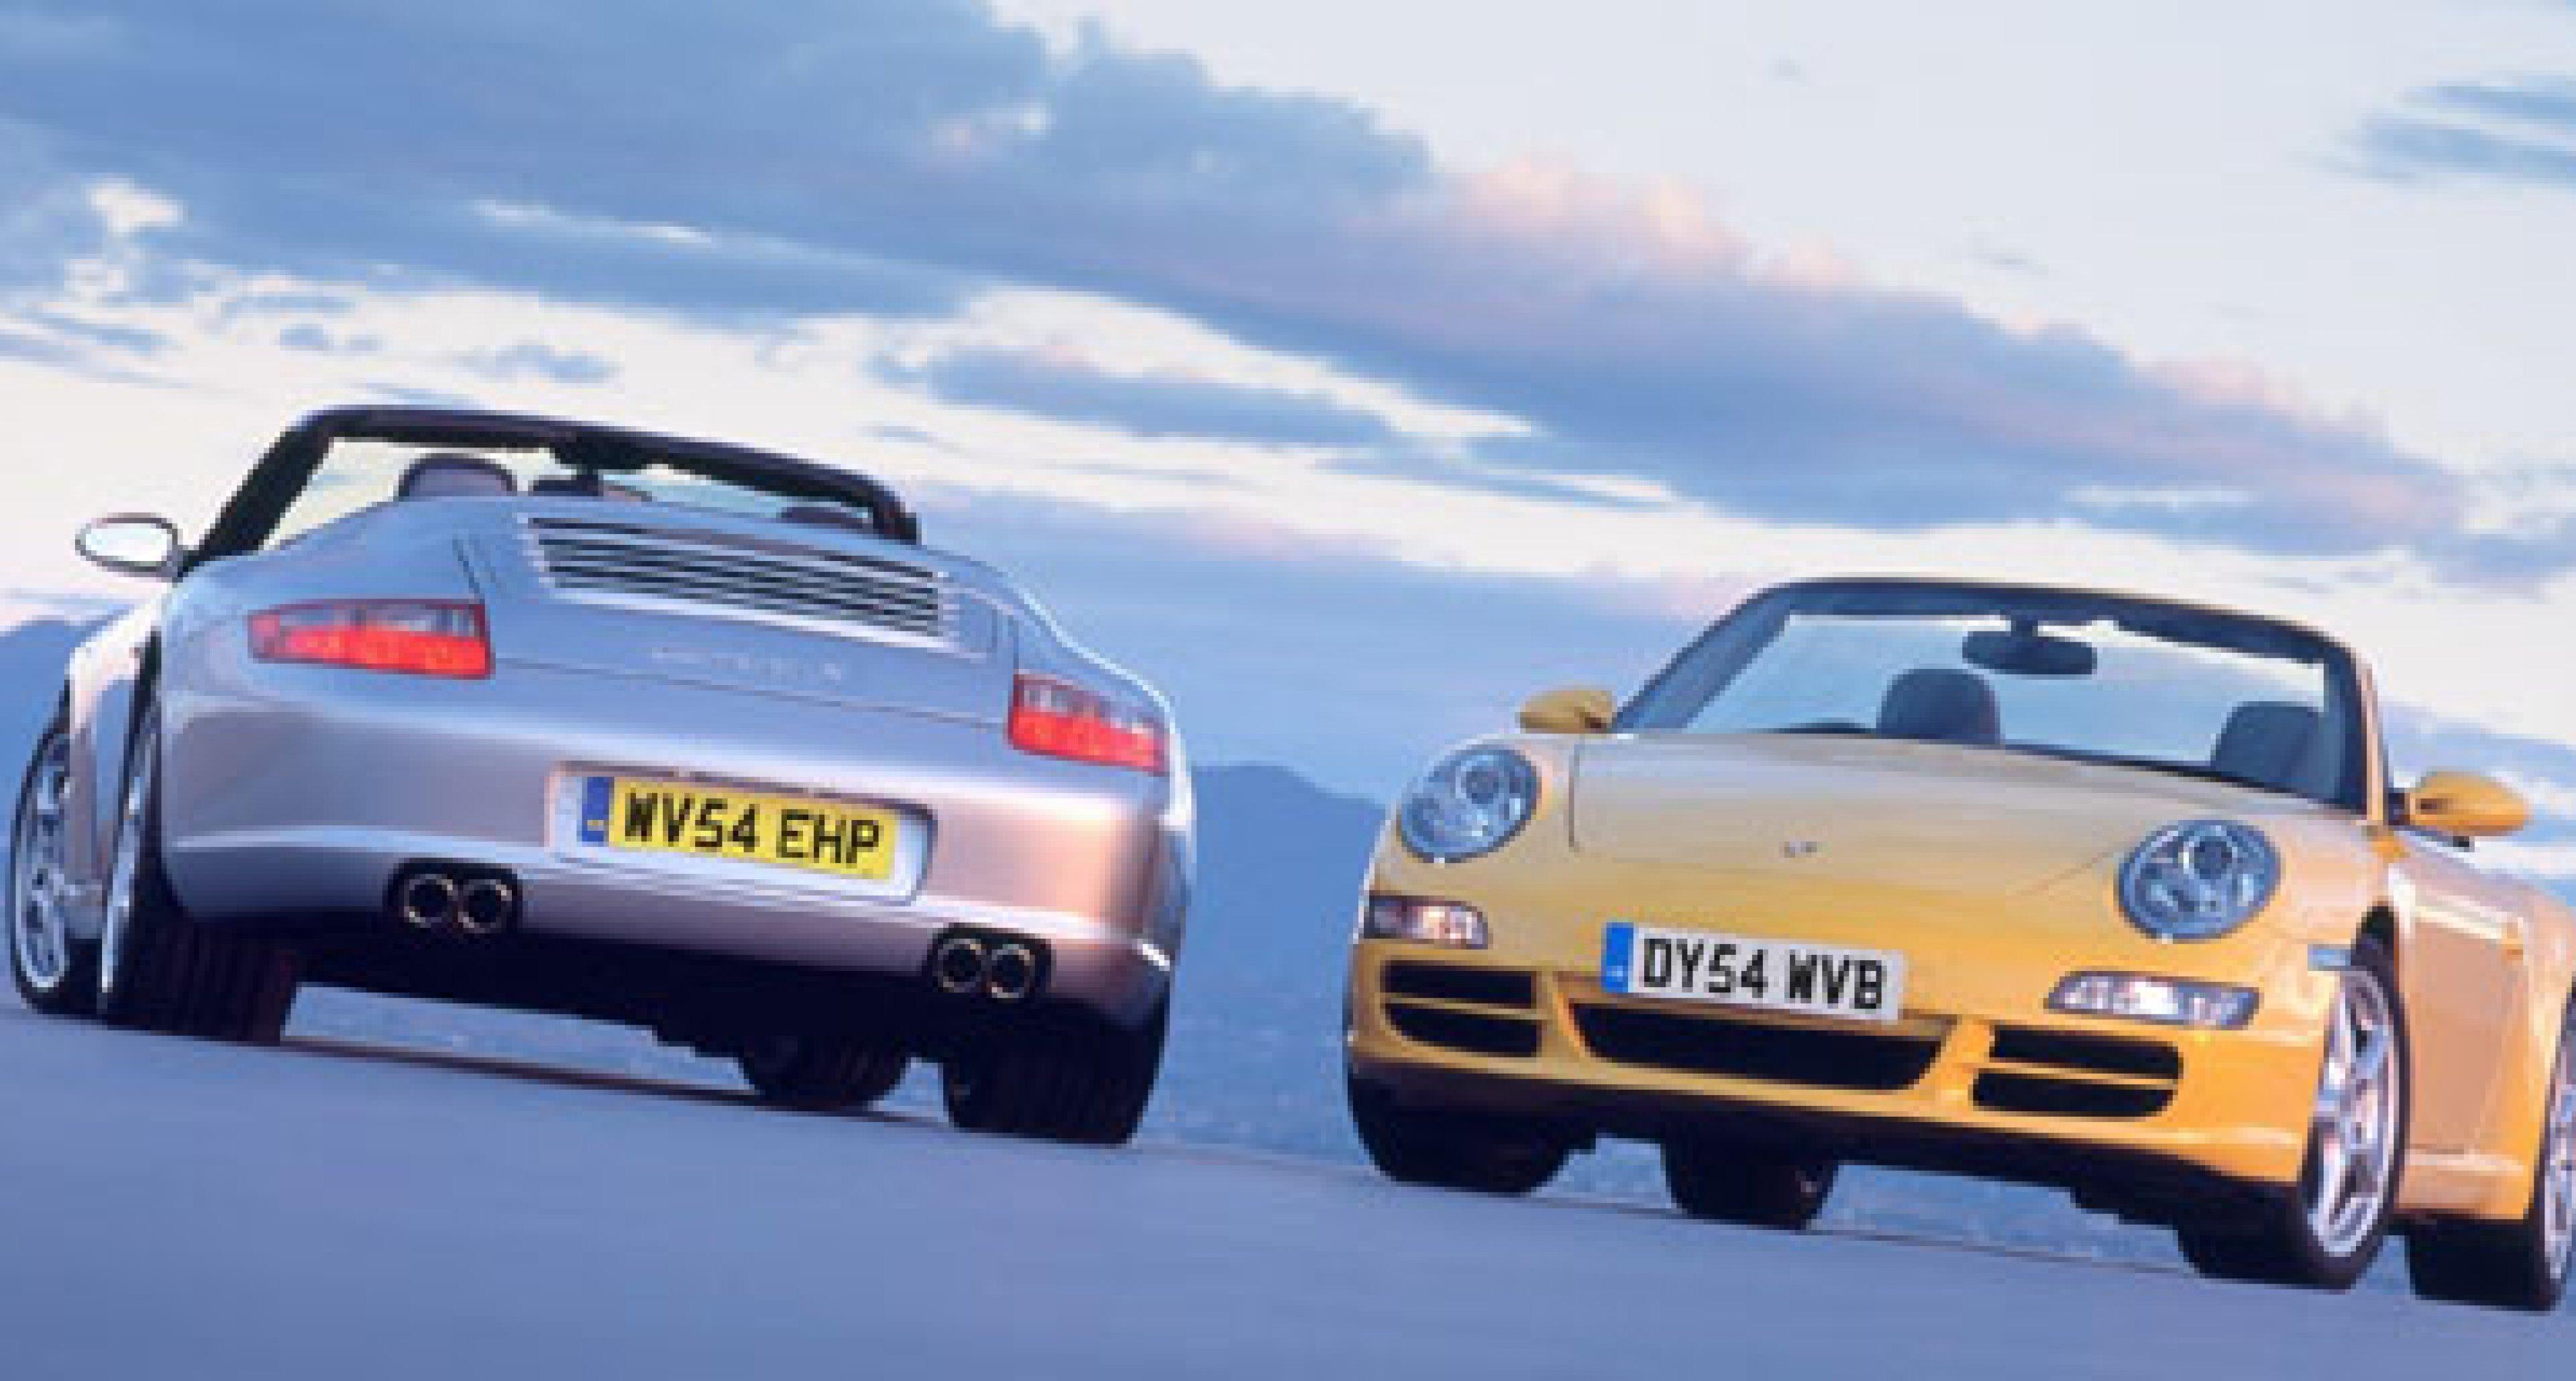 New Porsche 911 Cabriolet Revealed